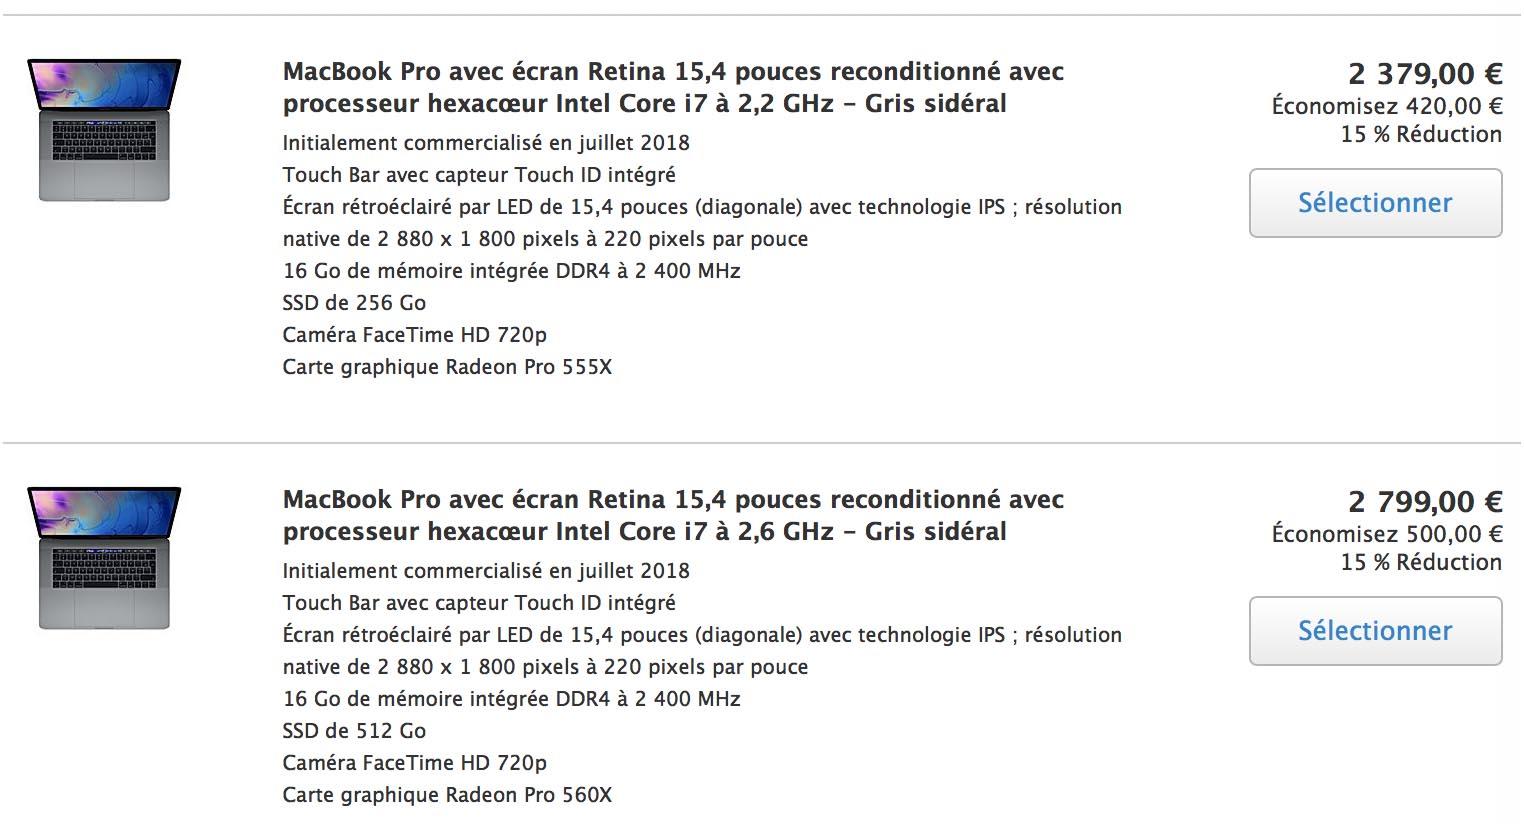 MacBook Pro 15 2018 Refurb Store